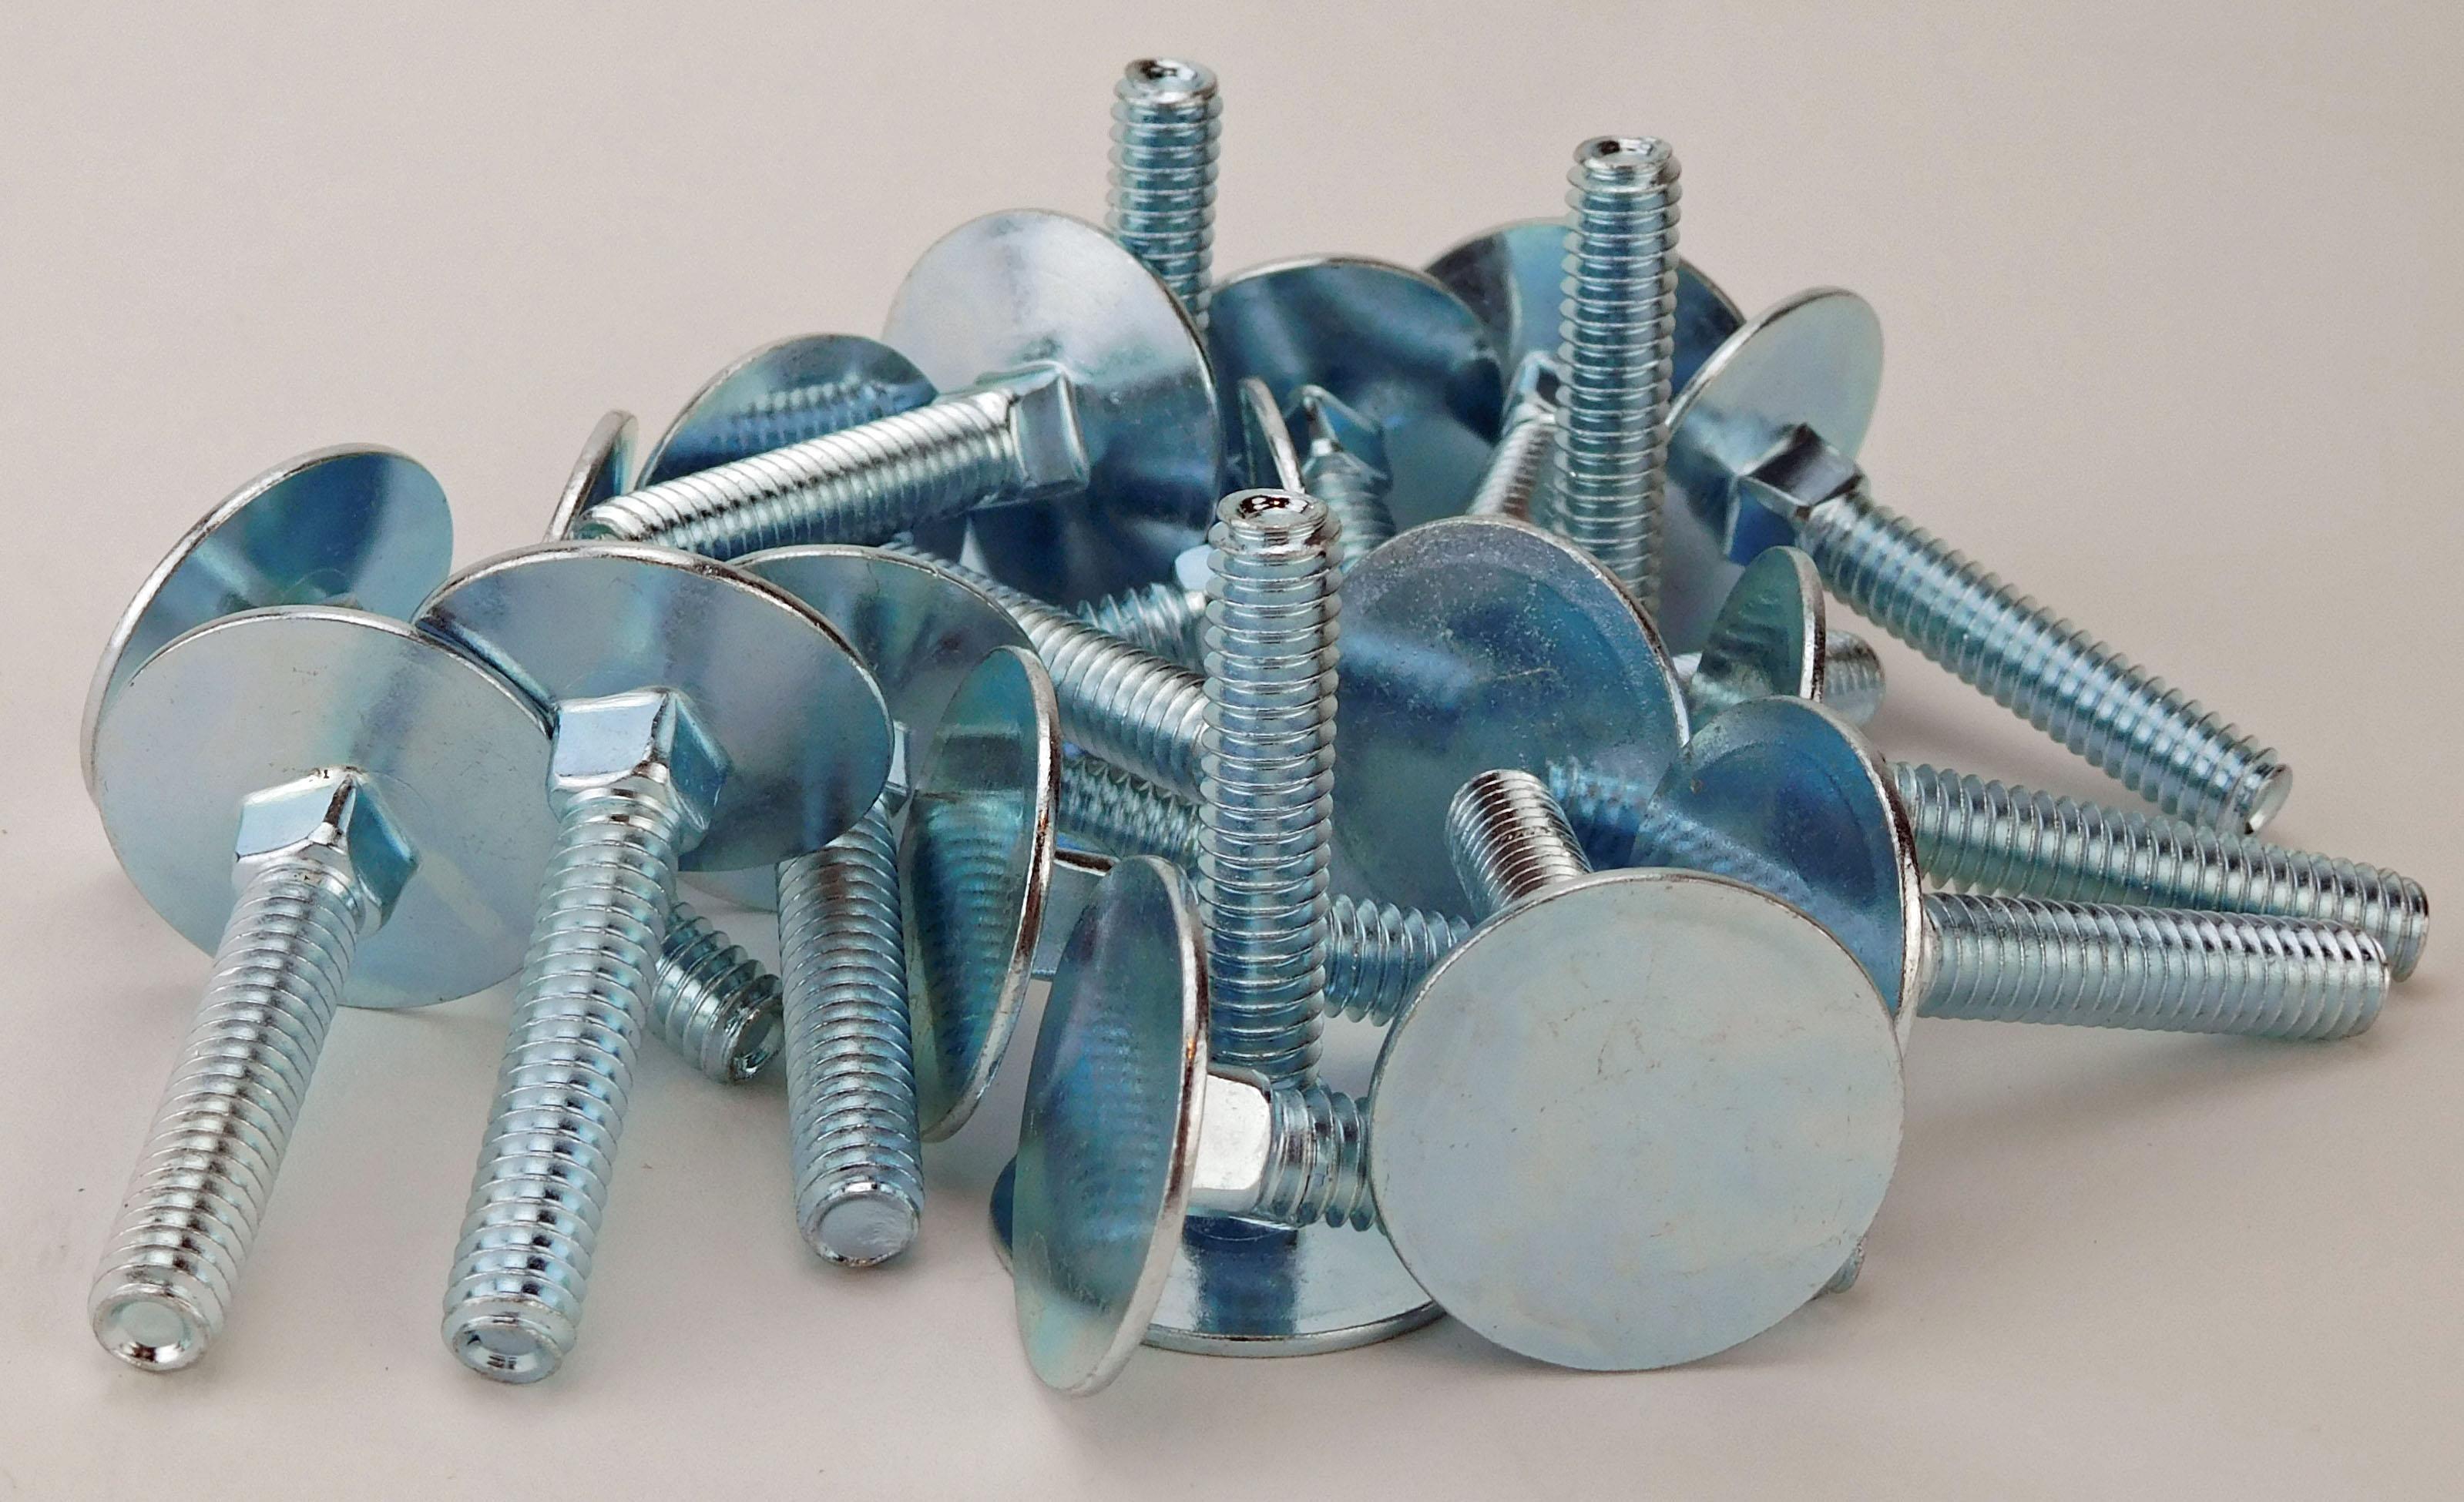 screws button cap reviews best helpful decorative in amazon decor head customer pcr allen rated com socket x